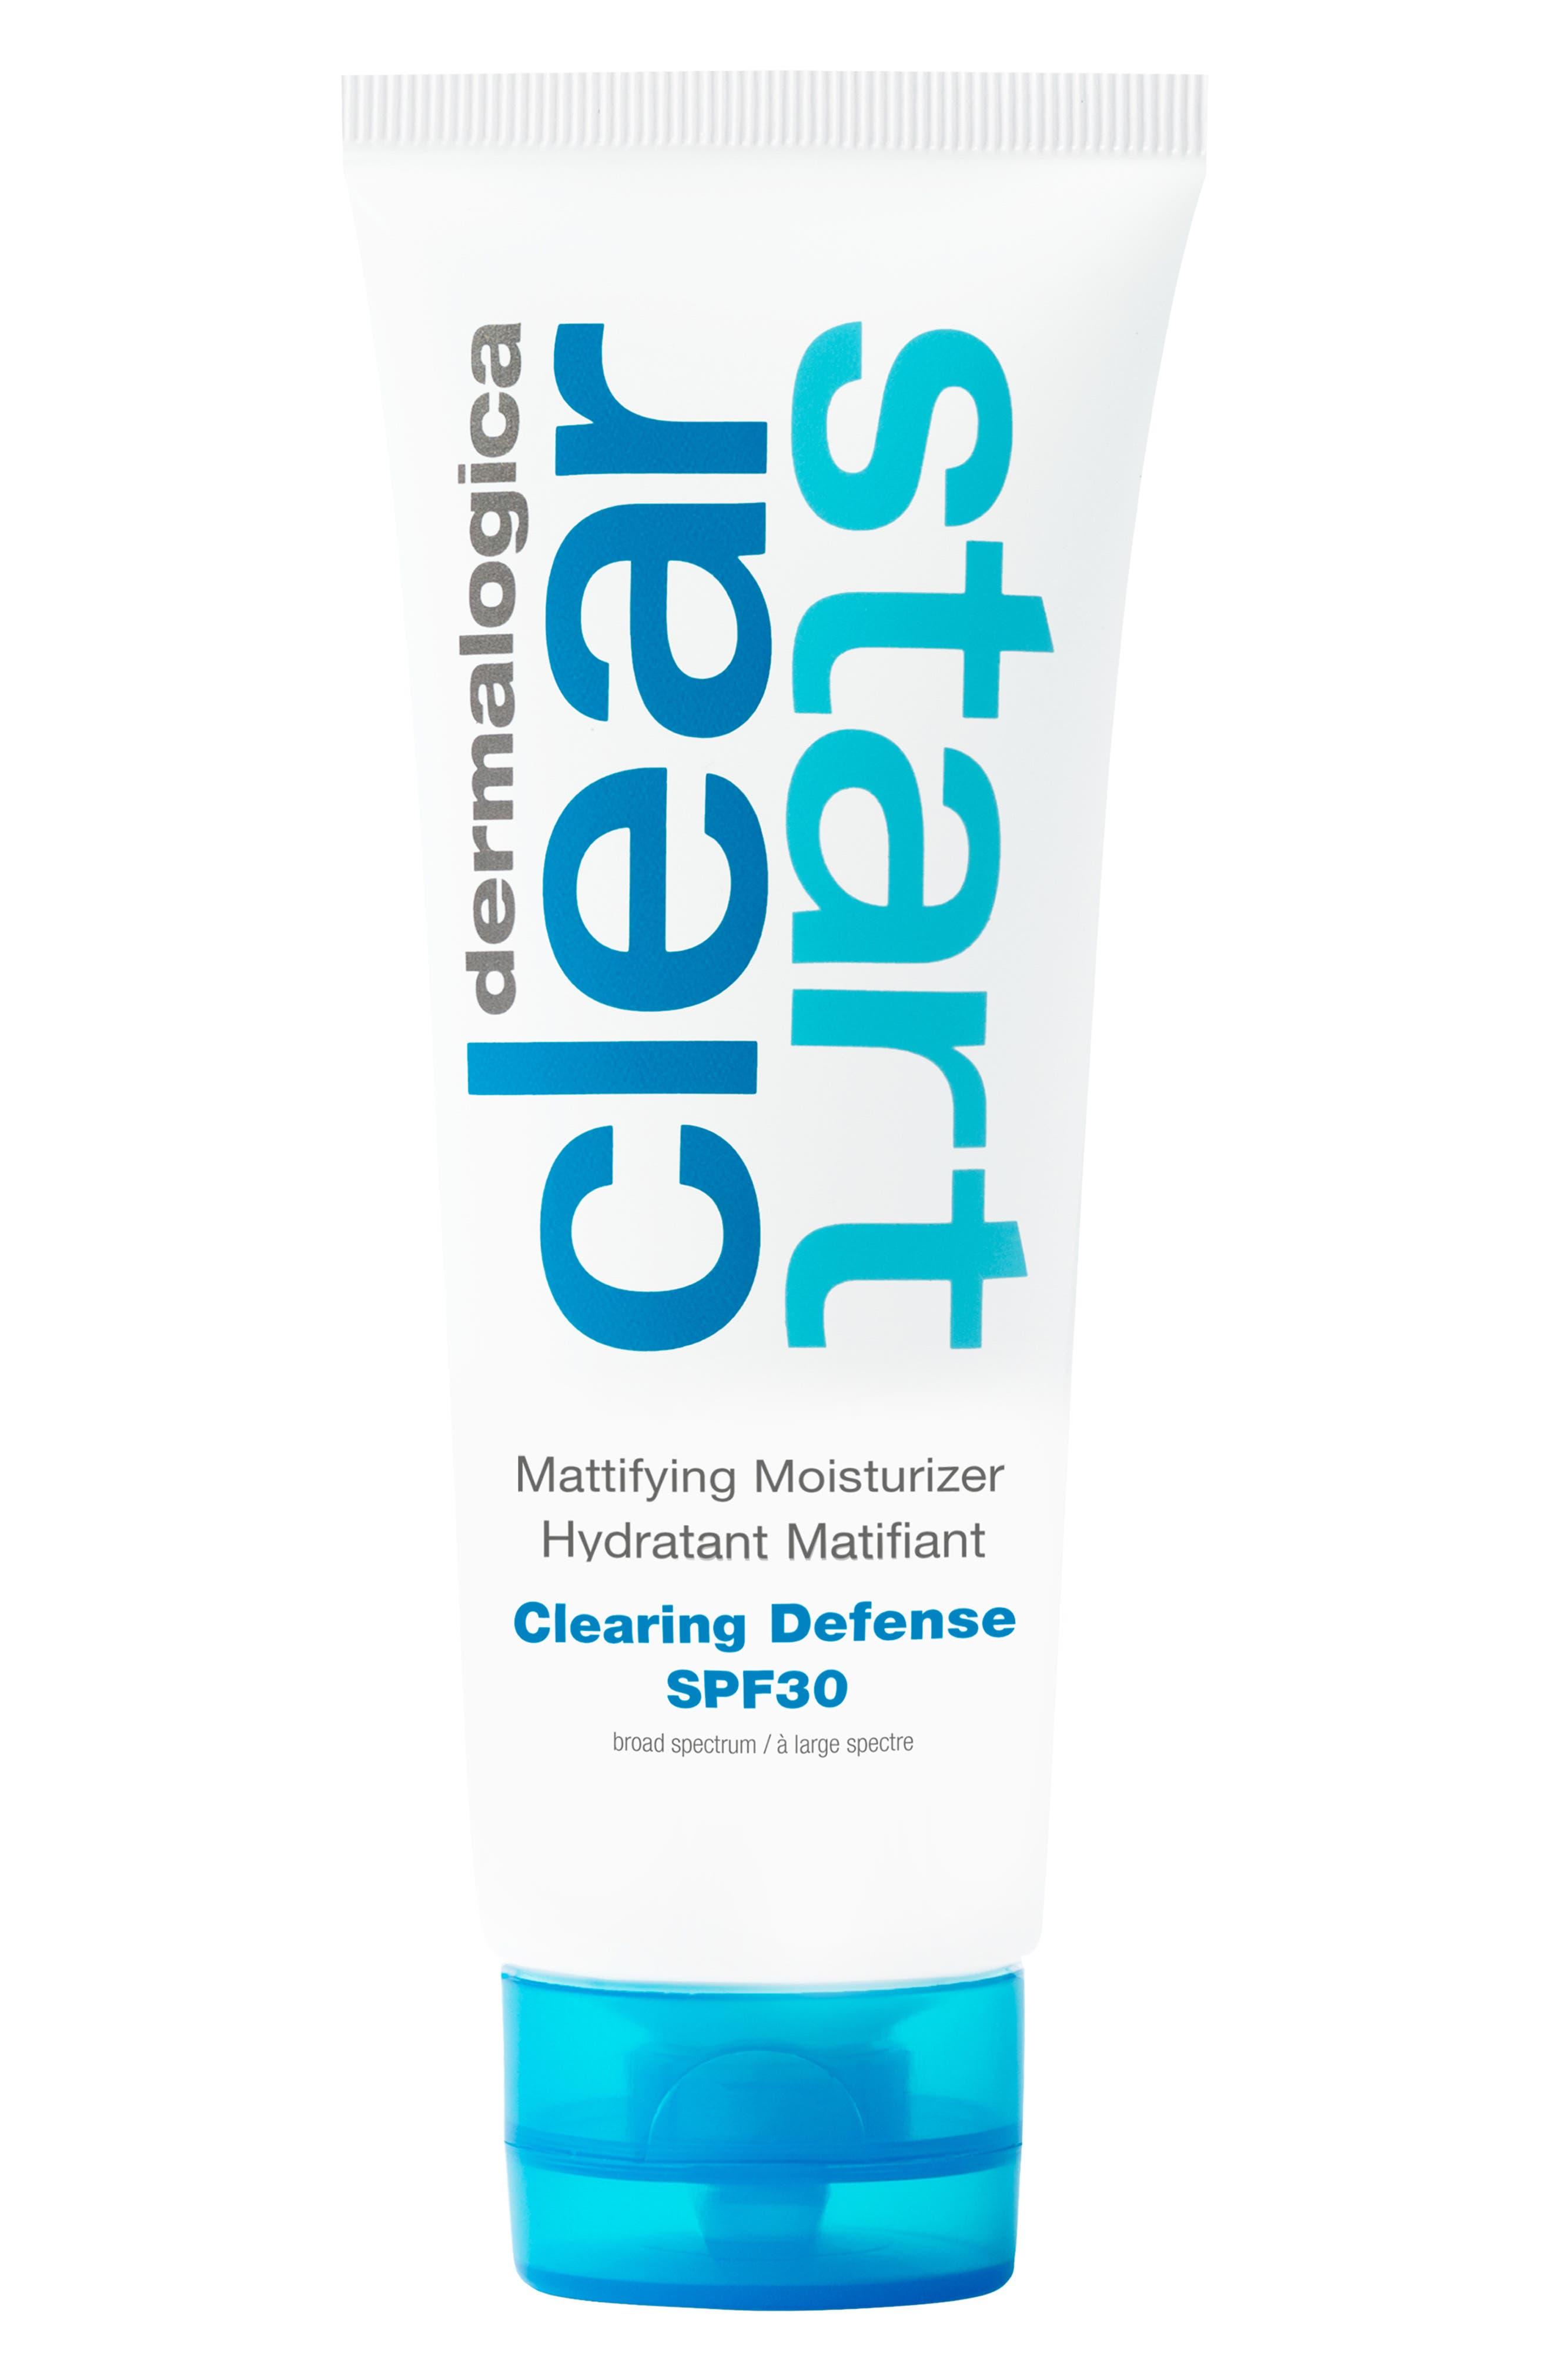 Dermalogica Clearing Defense Spf 30 Moisturizer